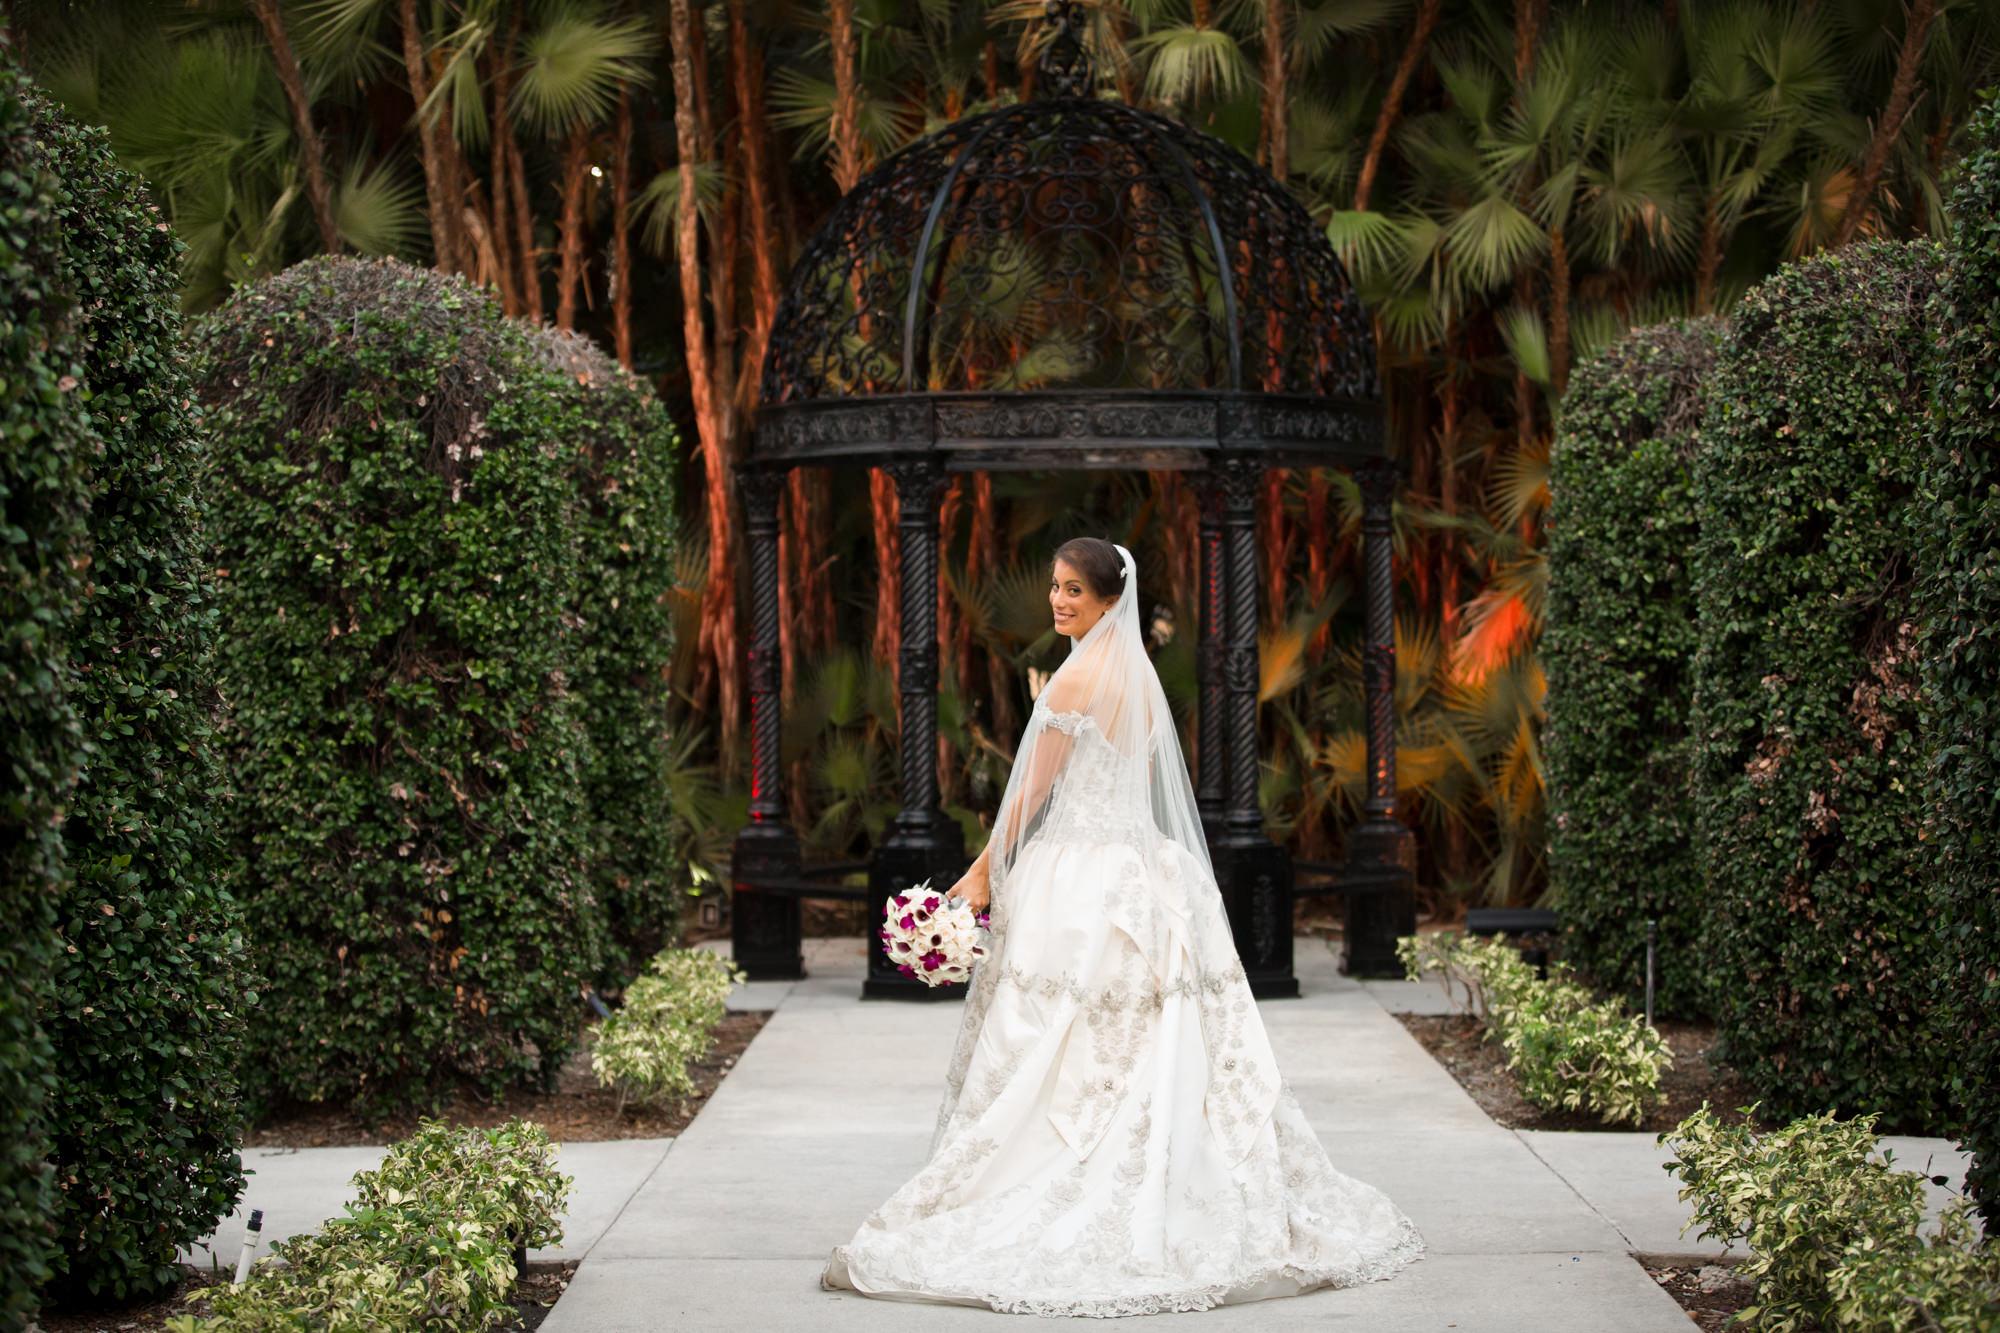 Benvenuto_Wedding_catholic_Florida_Bride-Groom-76.jpg